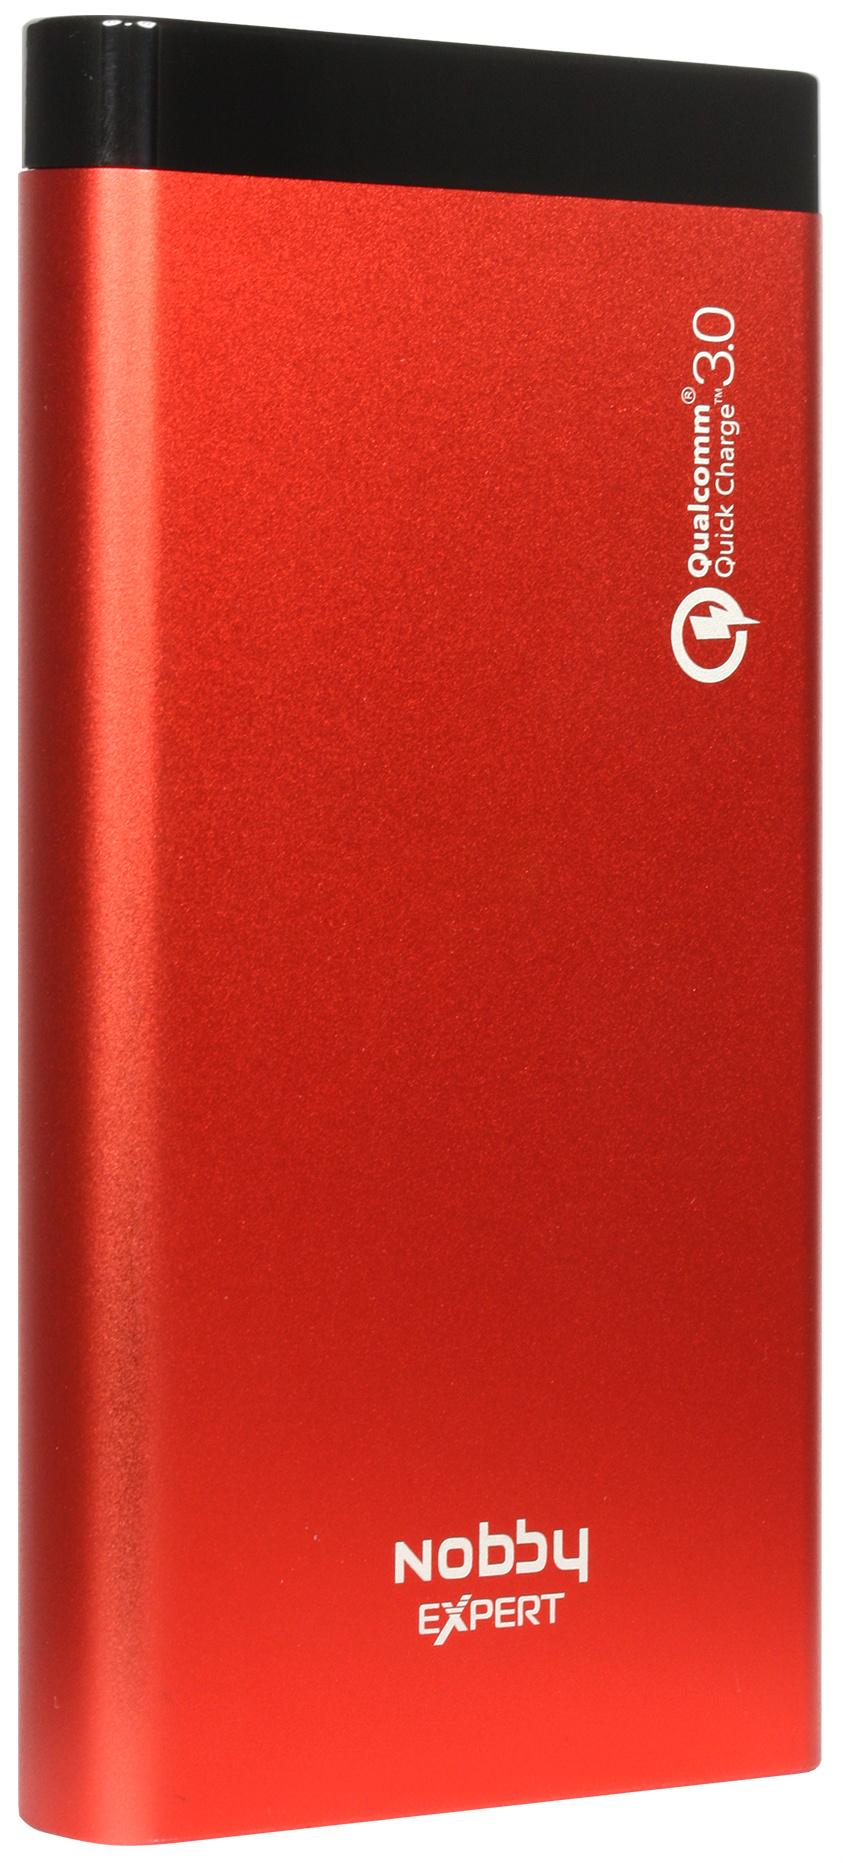 Внешний аккумулятор Nobby Eхpert 10000 мА/ч (NBE-PB-10-04) Red